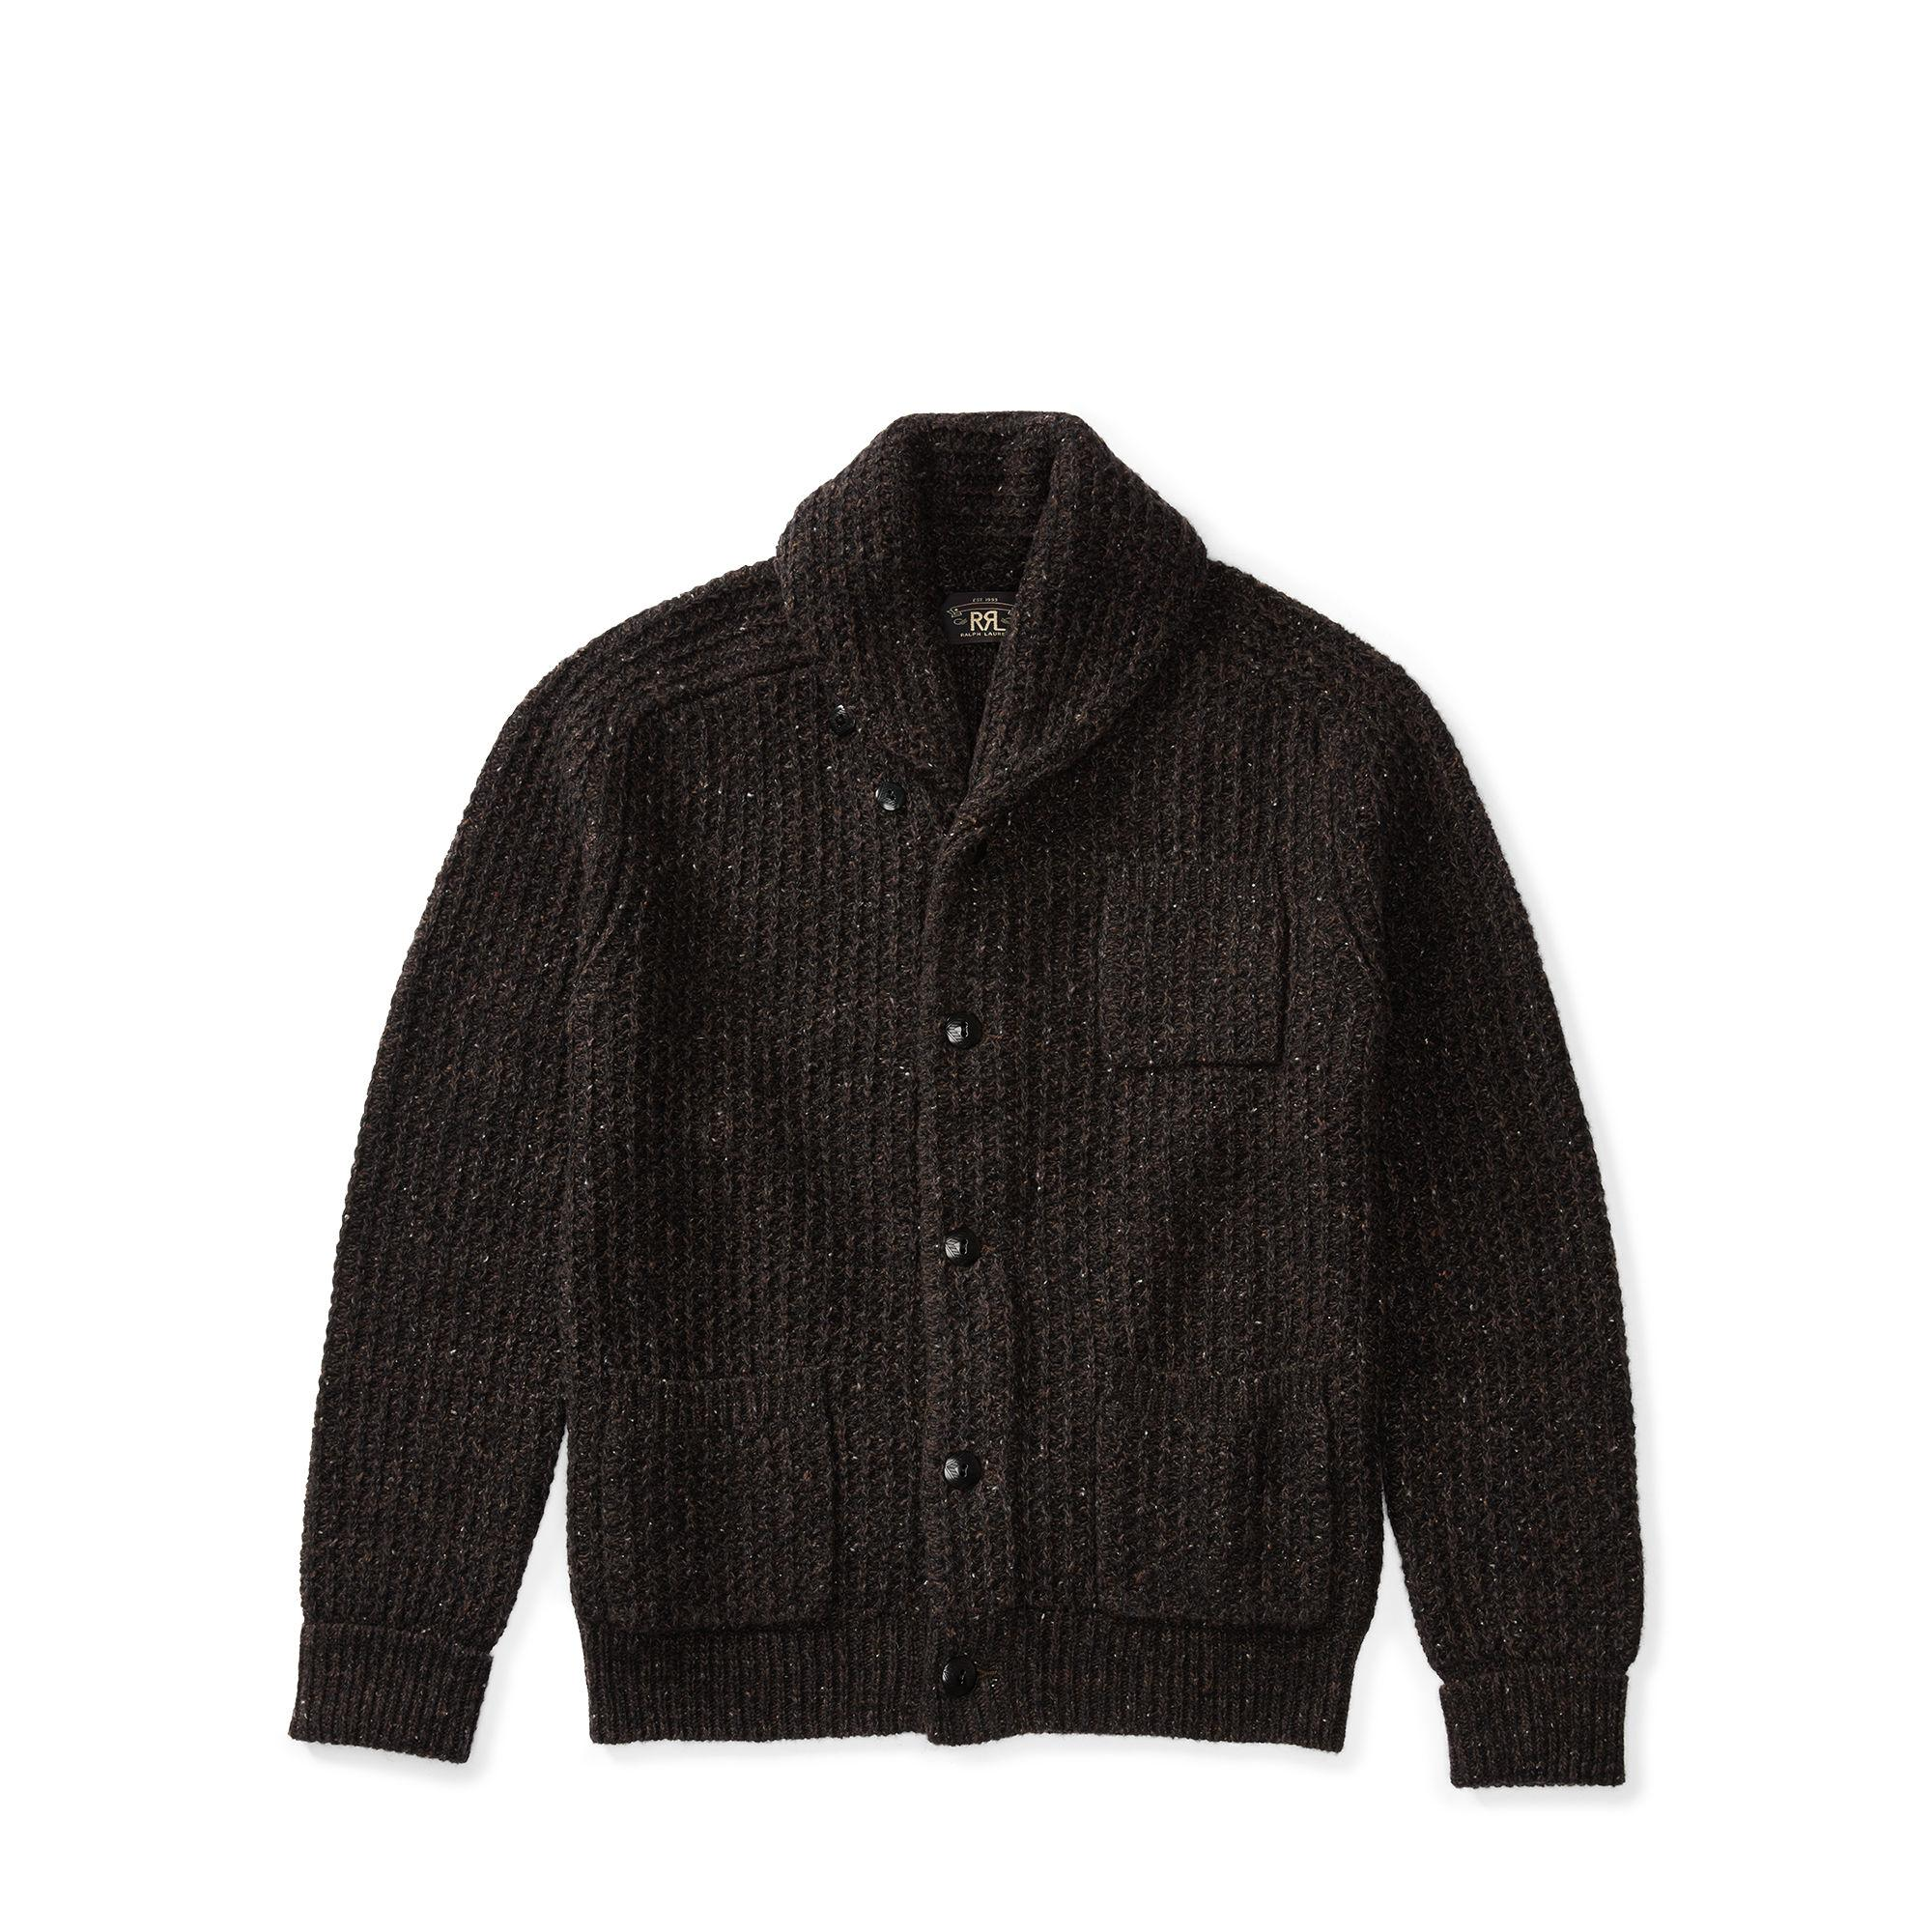 Lyst Rrl Indigo Cotton Blend Cardigan In Black For Men